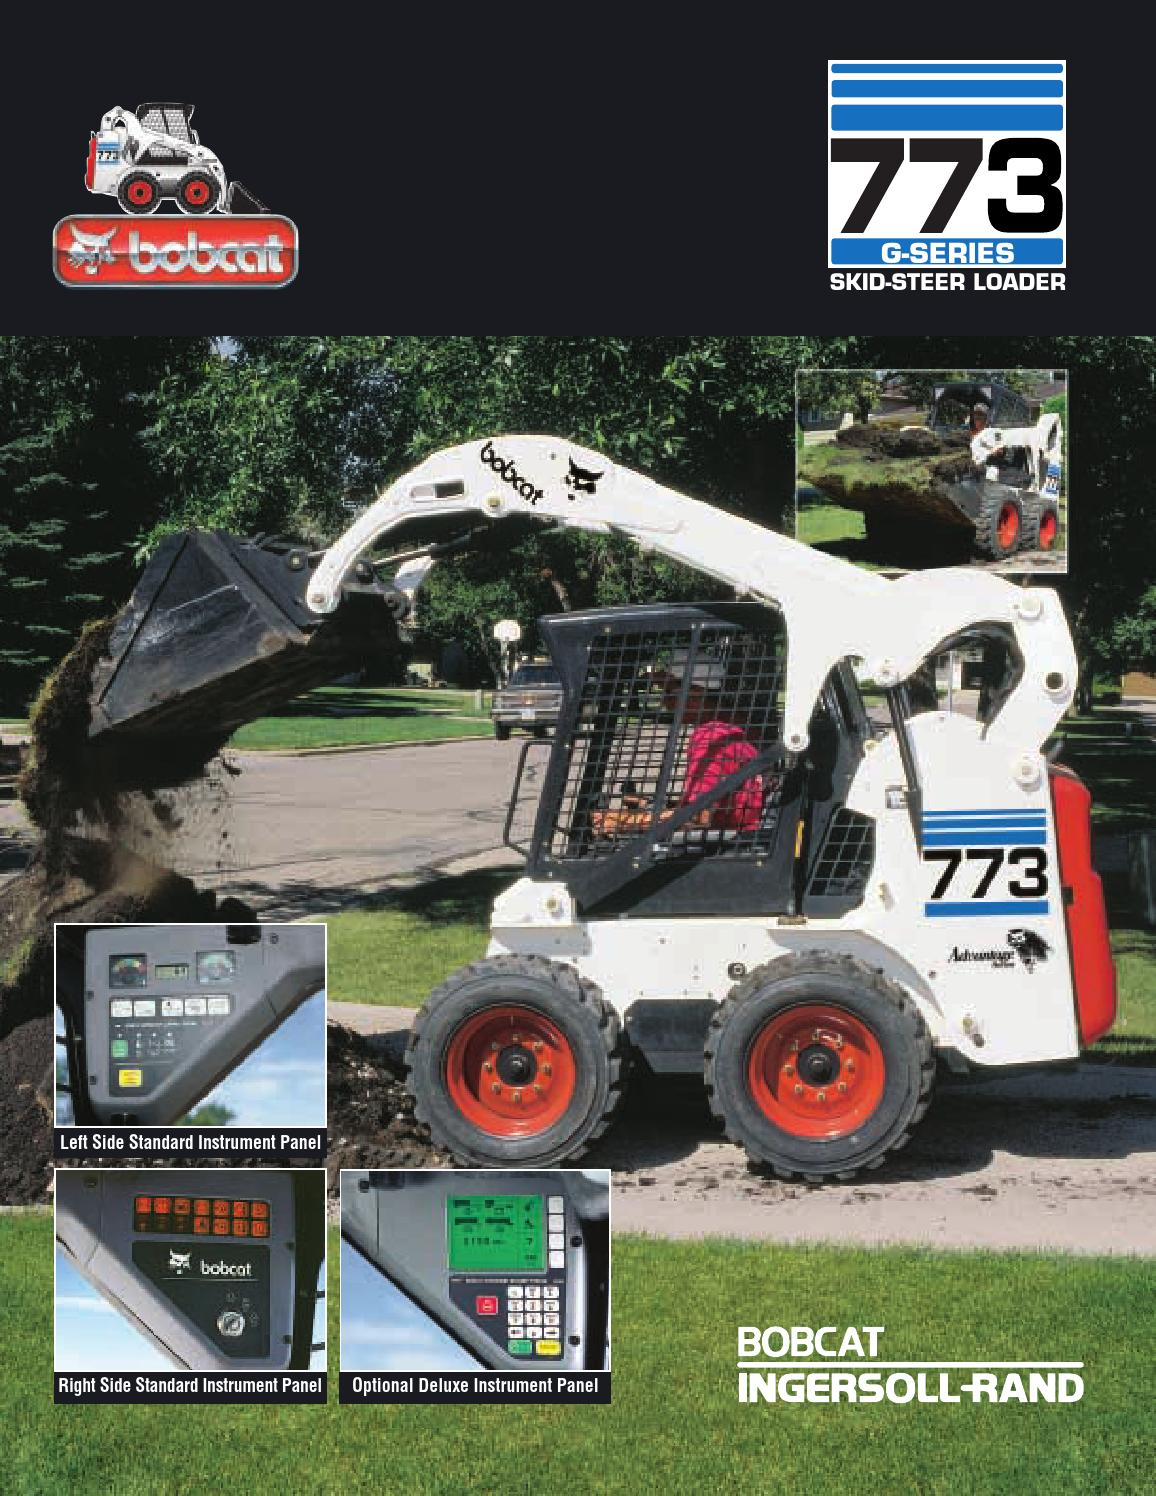 Bobcat 773G by BobCat's Service & Parts S A C  - issuu